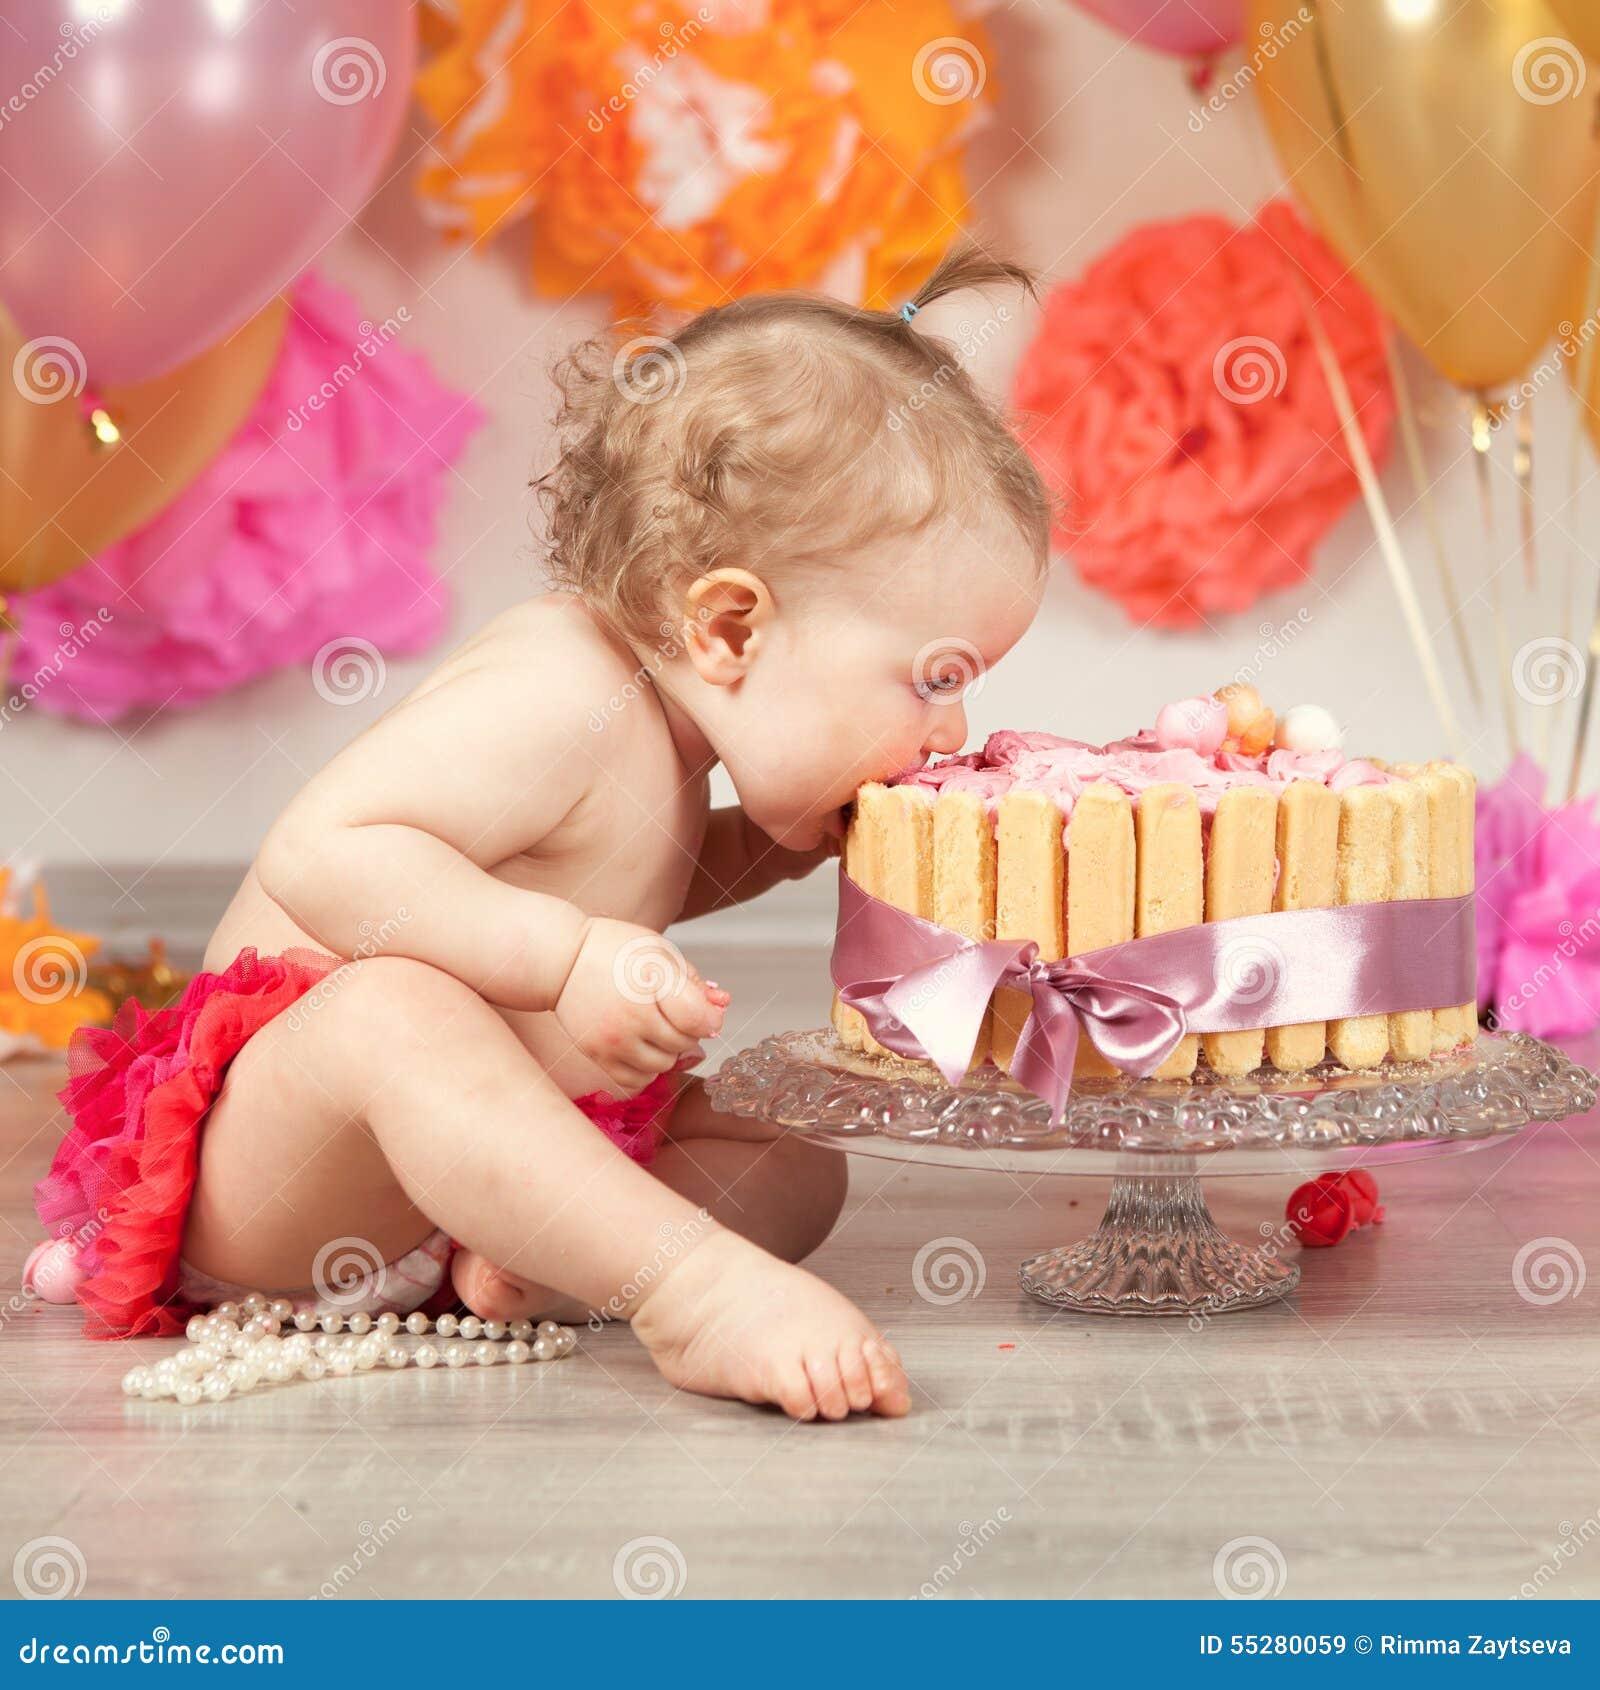 girl Happy birthday fat